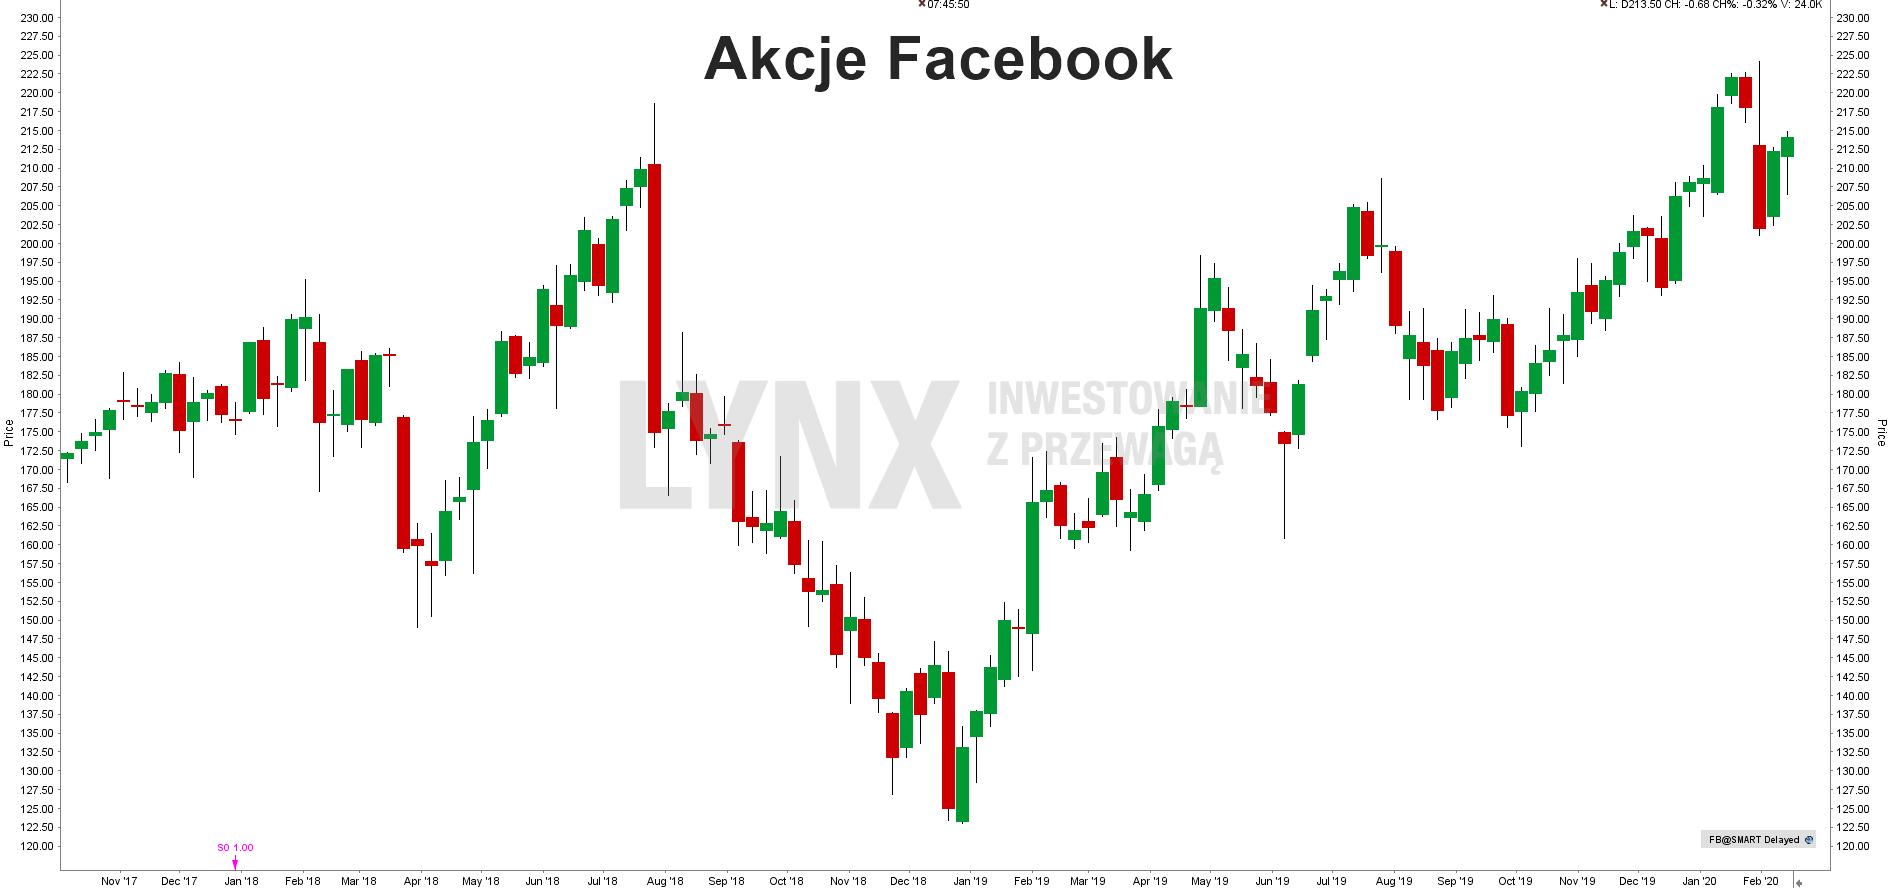 Akcje Facebook